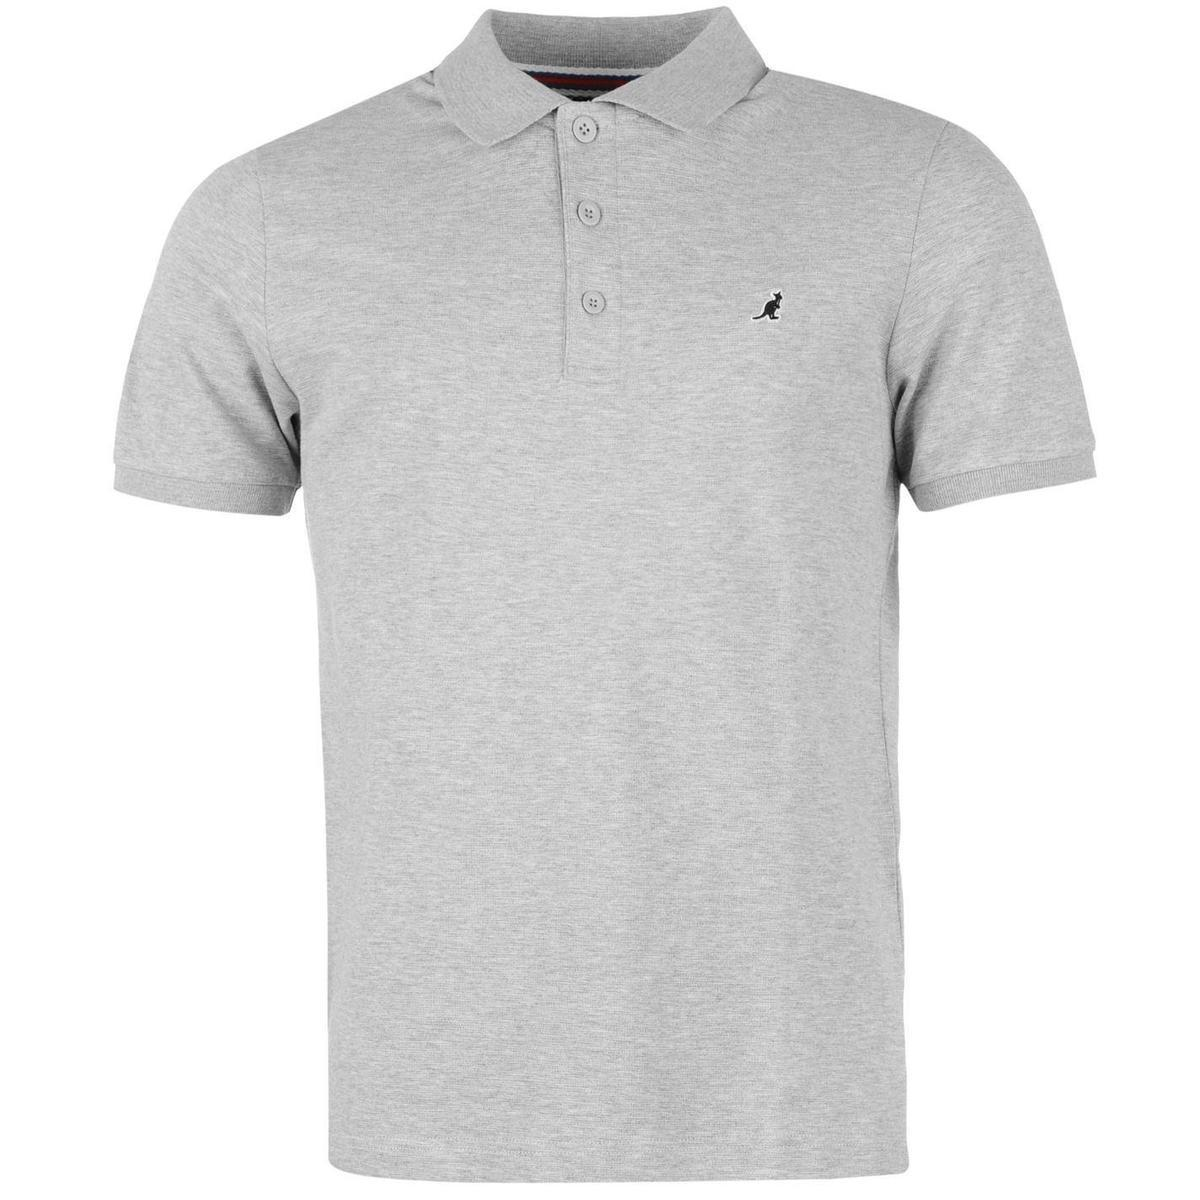 Kangol Brit Fit Polo Shirt Mens Light Grey Marl Collared T Shirt Top